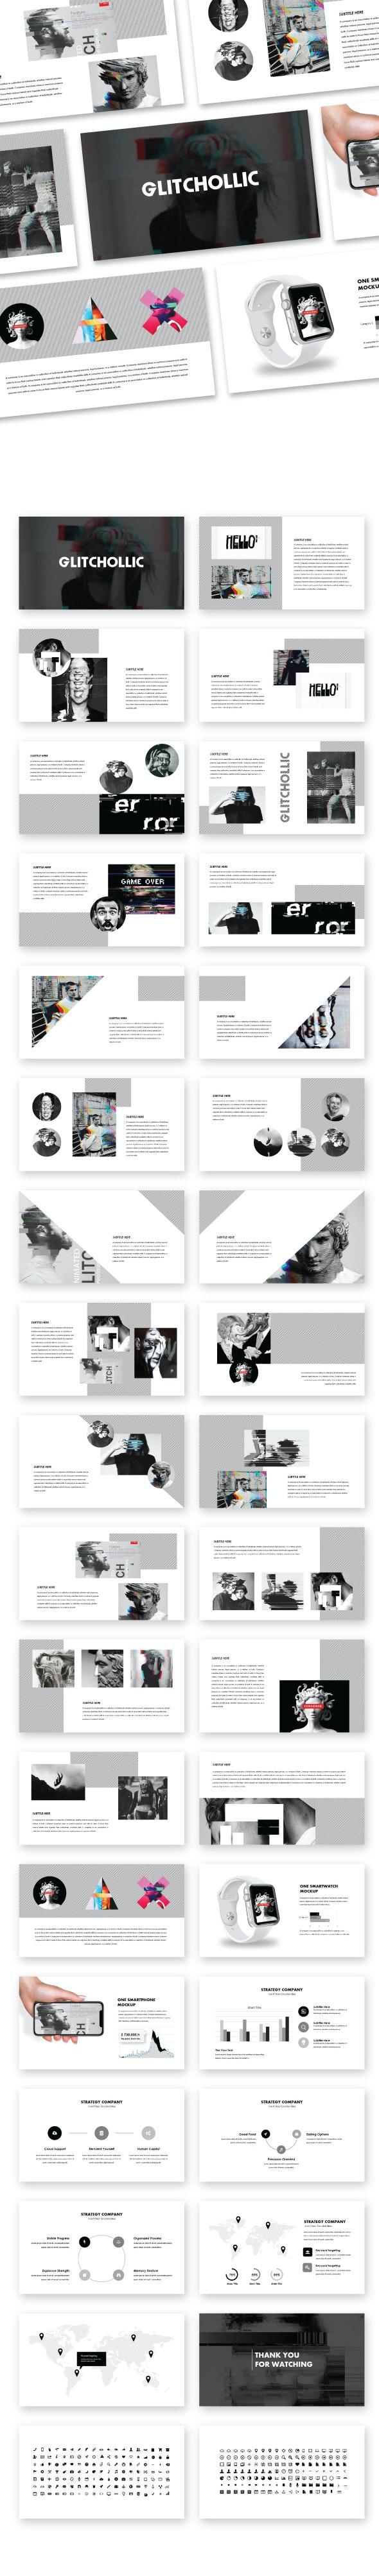 Glitchollic - Abstract & Creative GoogleSlide - PowerPoint Templates Presentation Templates